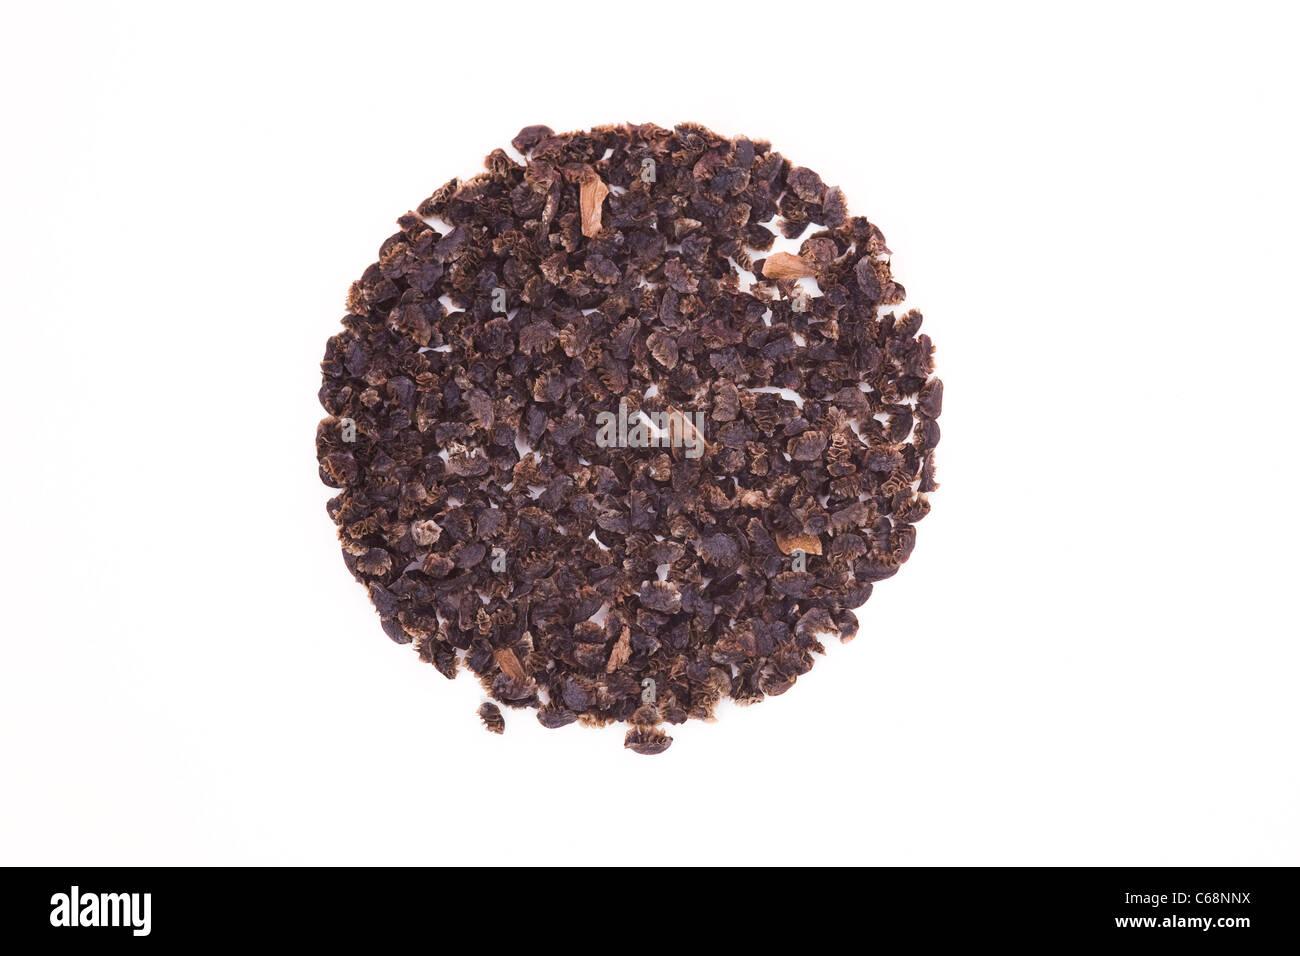 Aconitum. Monkshood seeds on a white background. - Stock Image